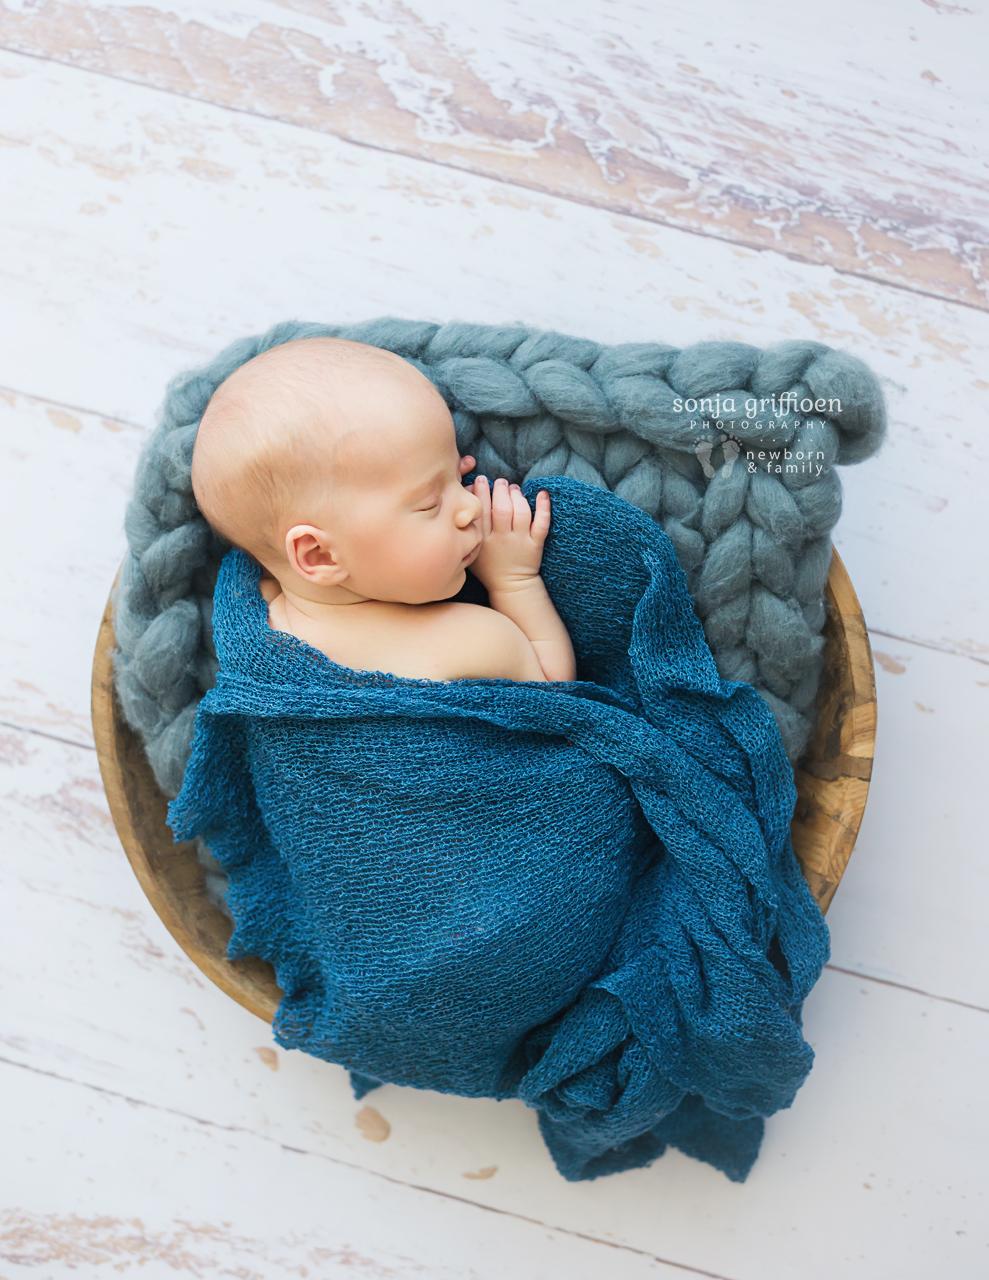 Fletcher-Newborn-Brisbane-Newborn-Photographer-Sonja-Griffioen-39.jpg